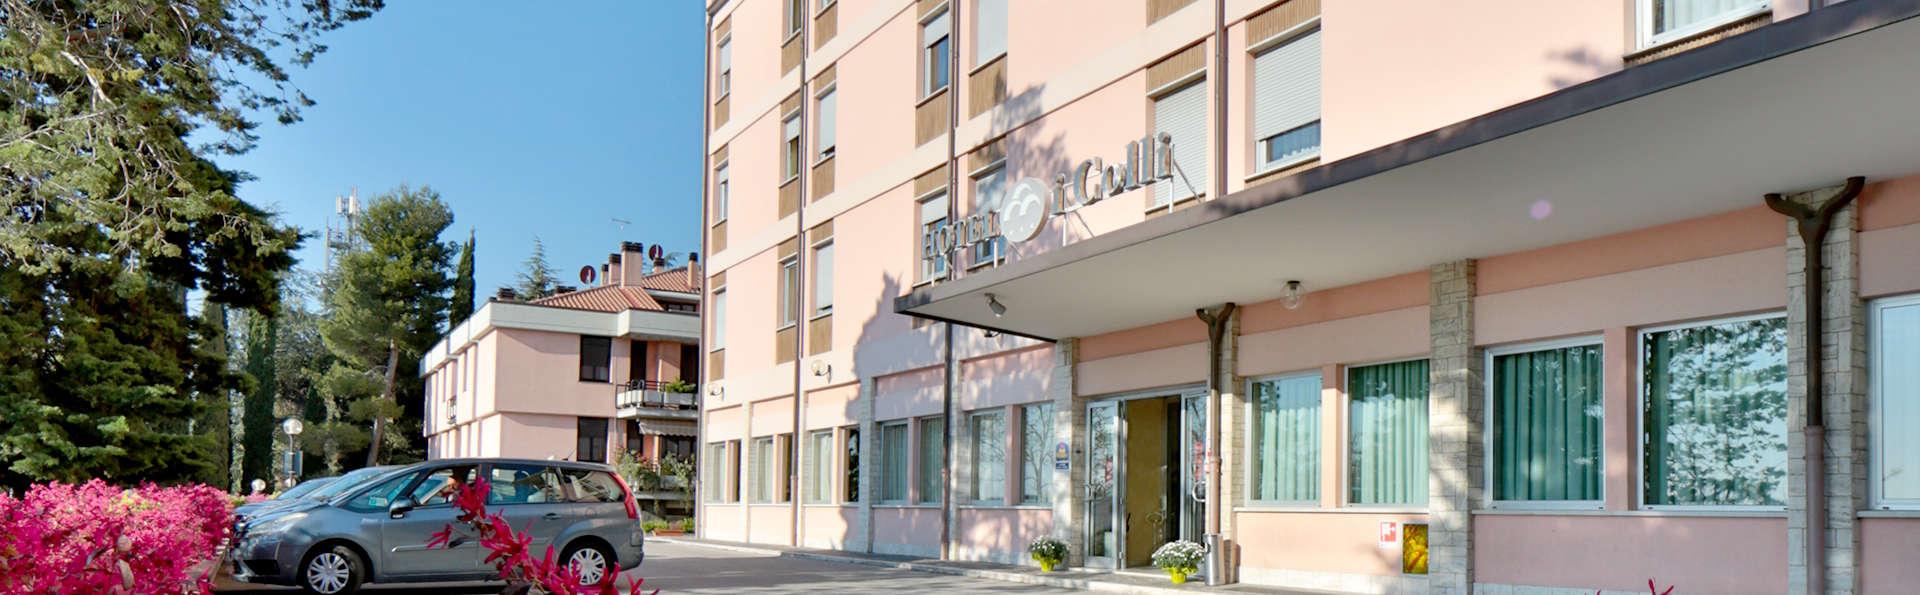 Best Western Hotel I Colli - Edit_Front.jpg